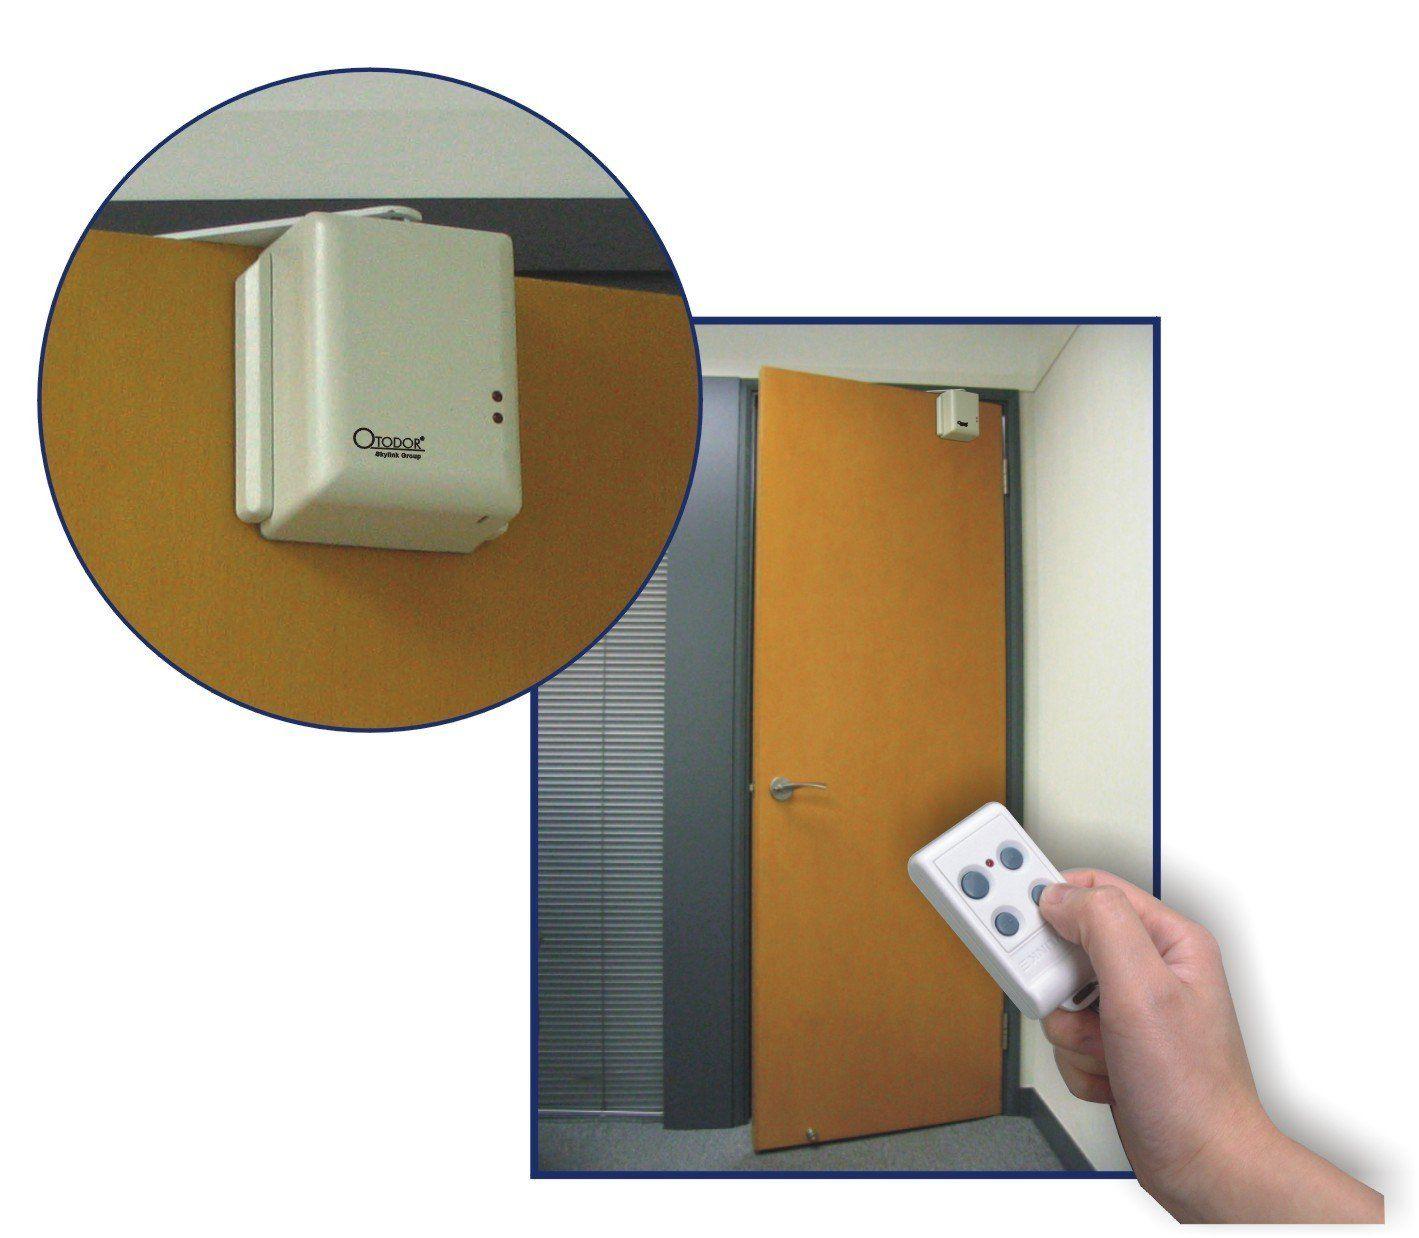 Open And Close A Standard Swing Door By Remote Control Using The Skylink Automatic Swing Door Opener Automatic Door Opener Automatic Door Sliding Door Design